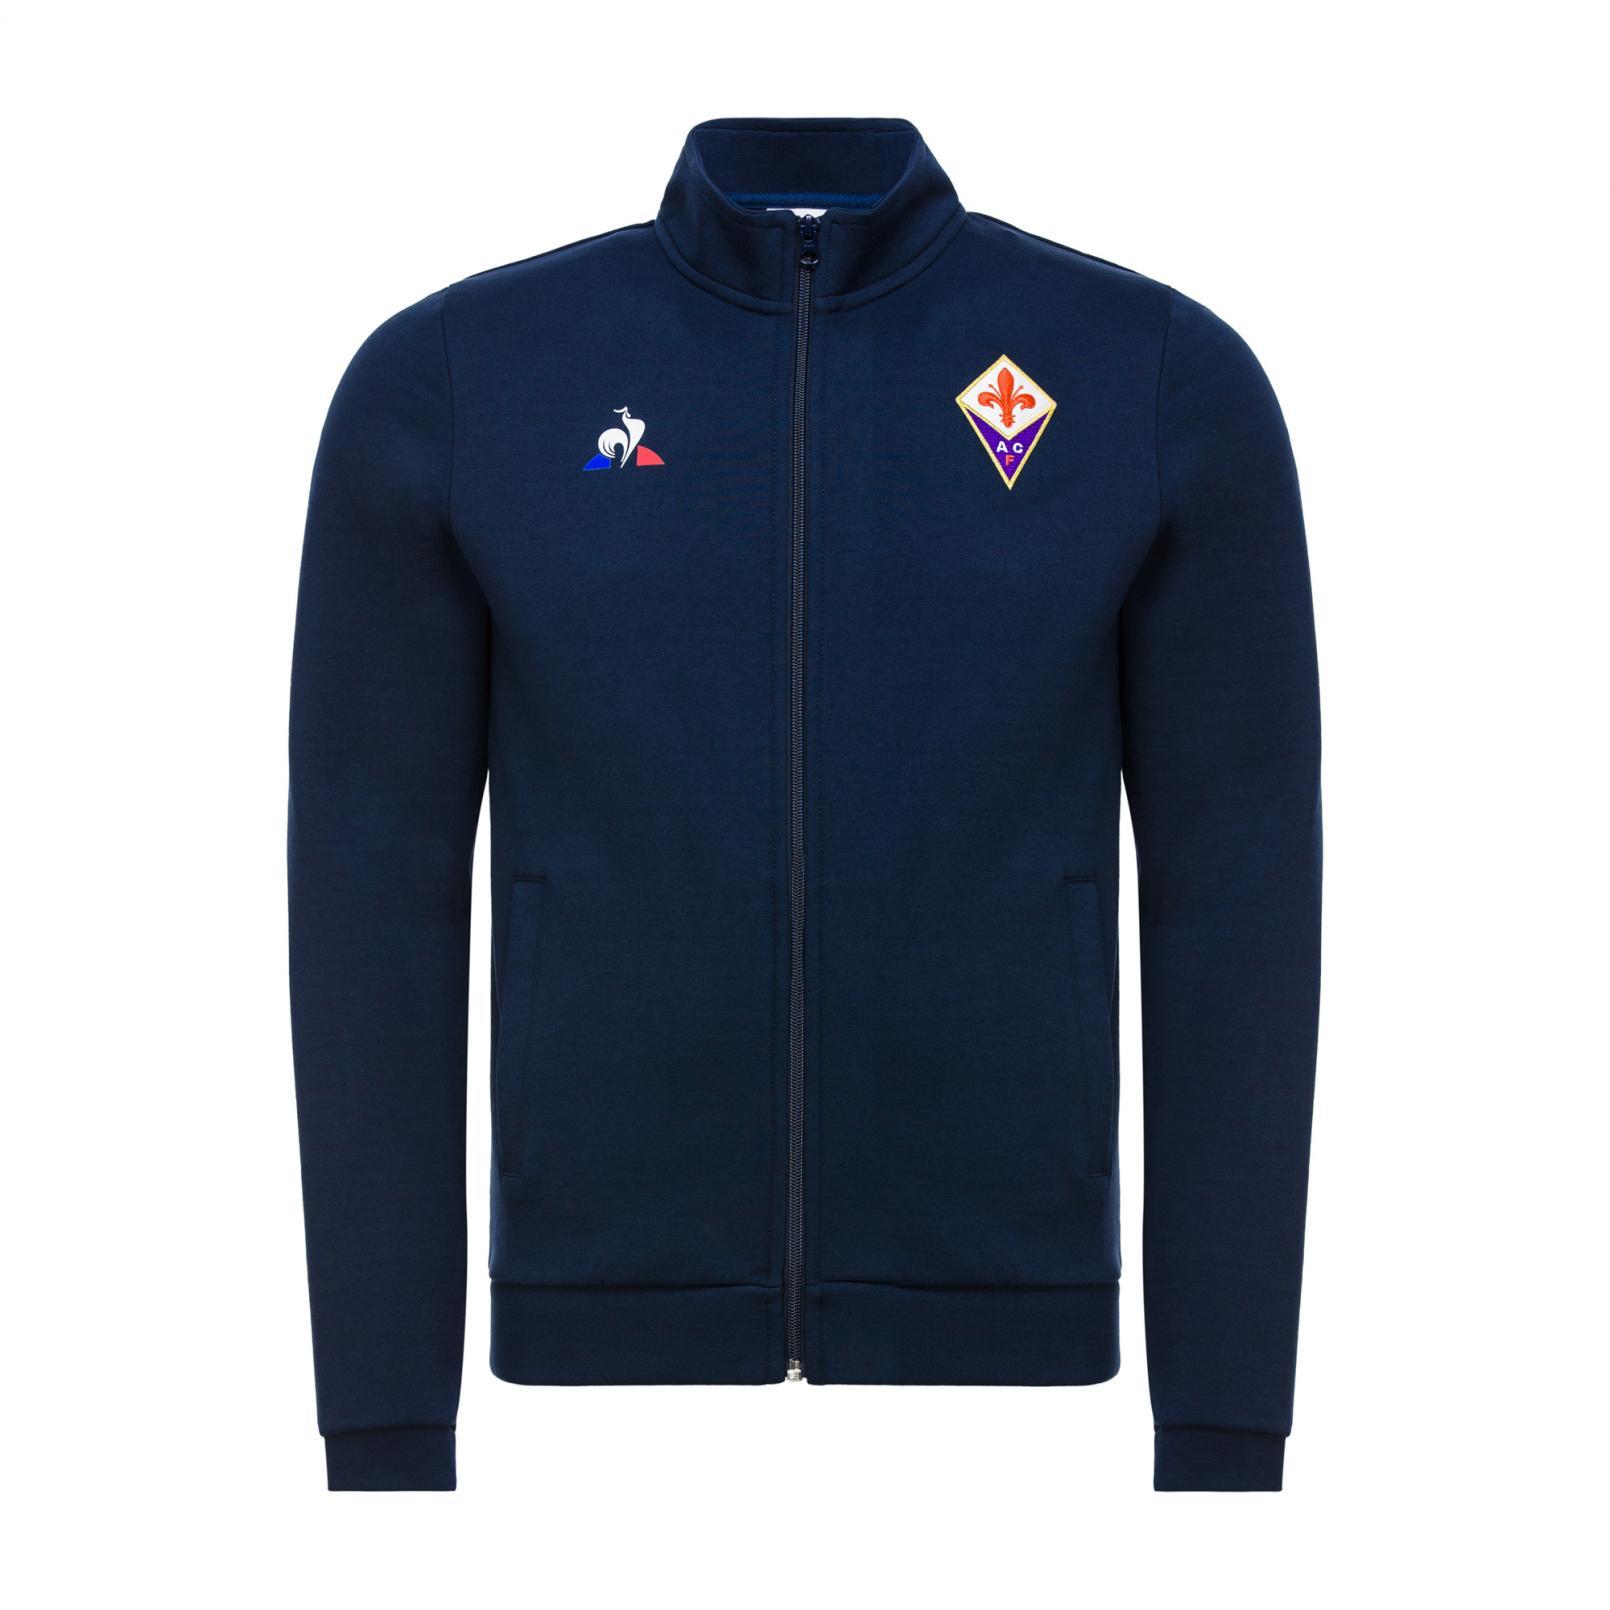 Sweat tops – Le Coq Sportif Fiorentina Pres Full zip sweatsthirt Blue